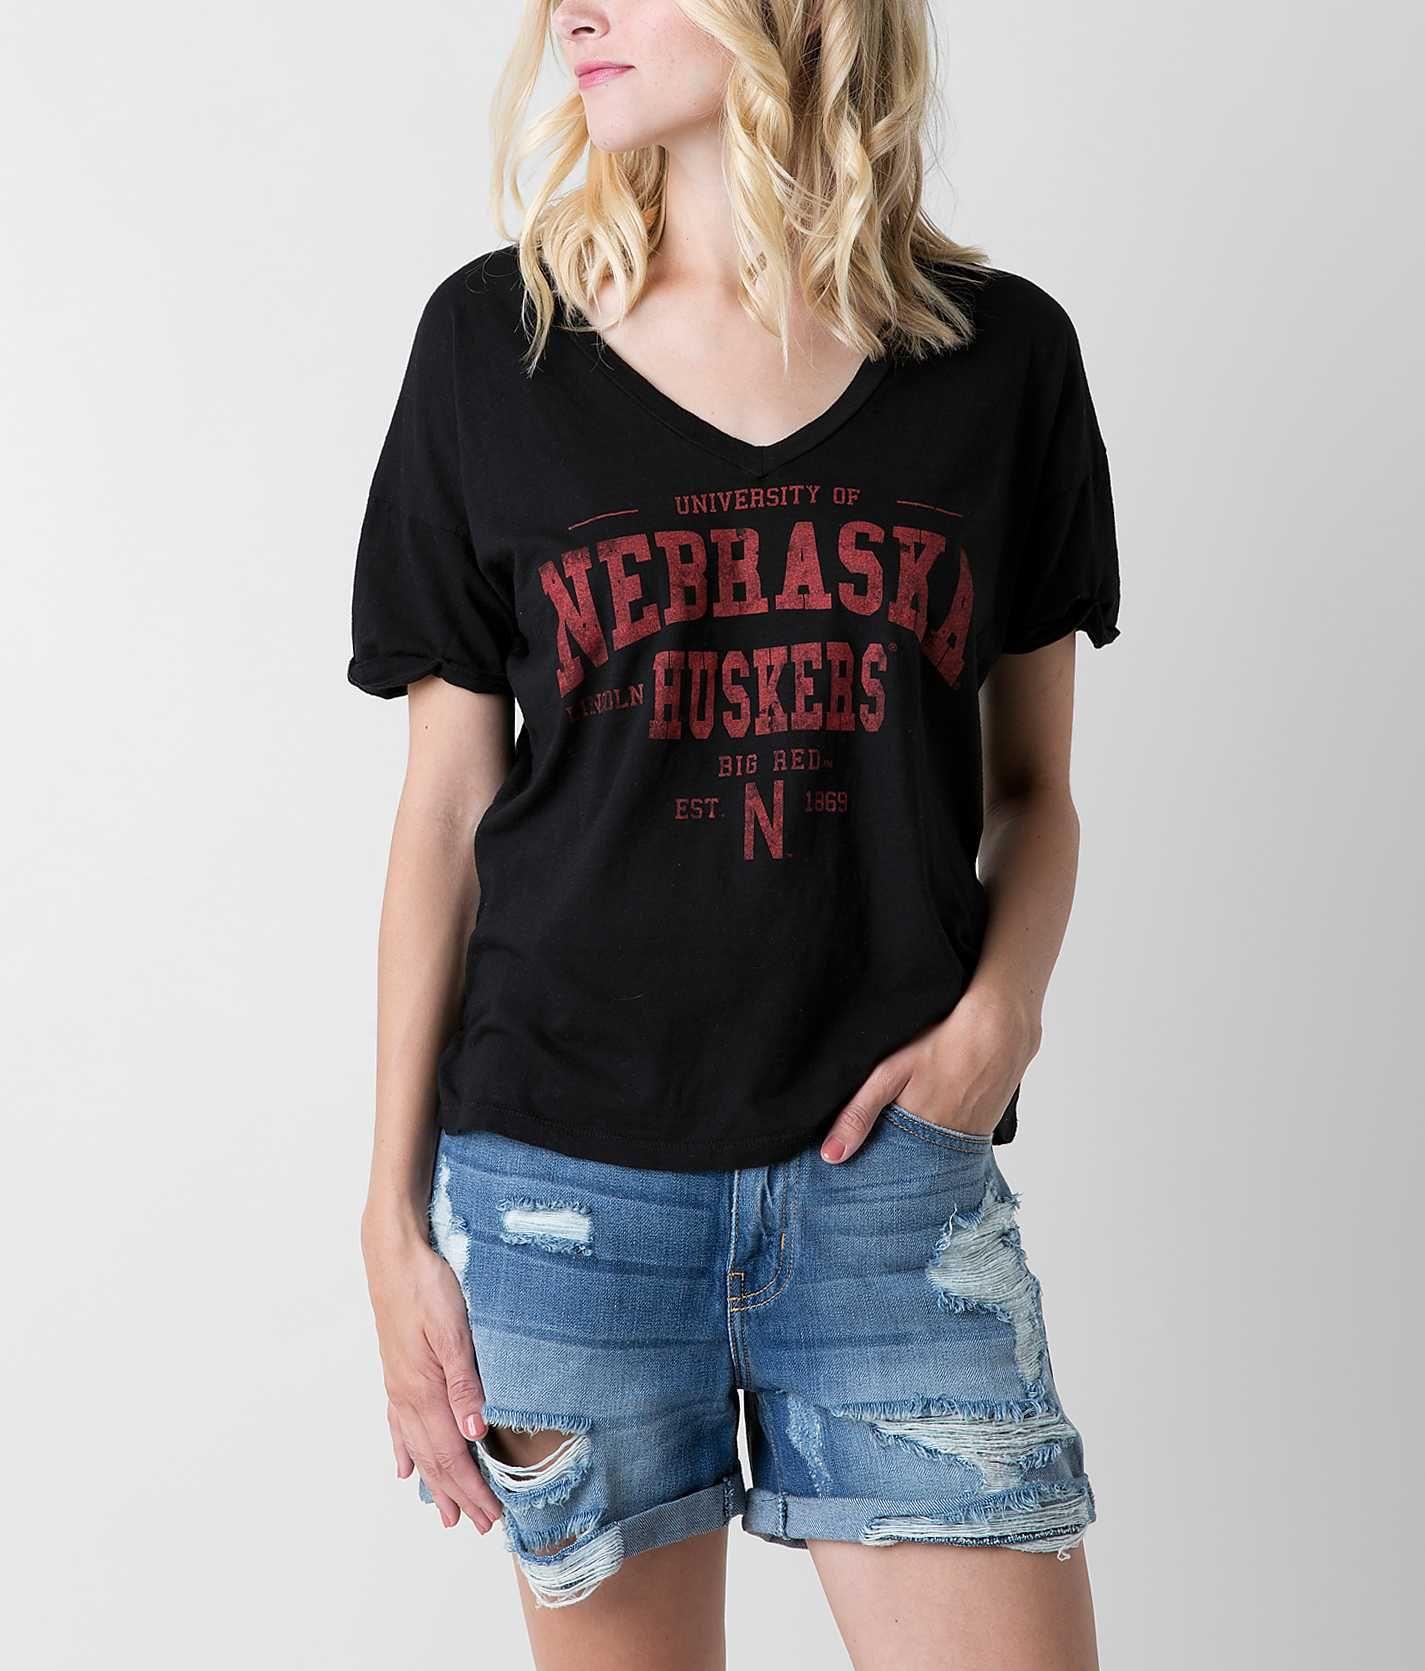 Retro Brand Nebraska T-Shirt - Women's Shirts/Tops | Buckle